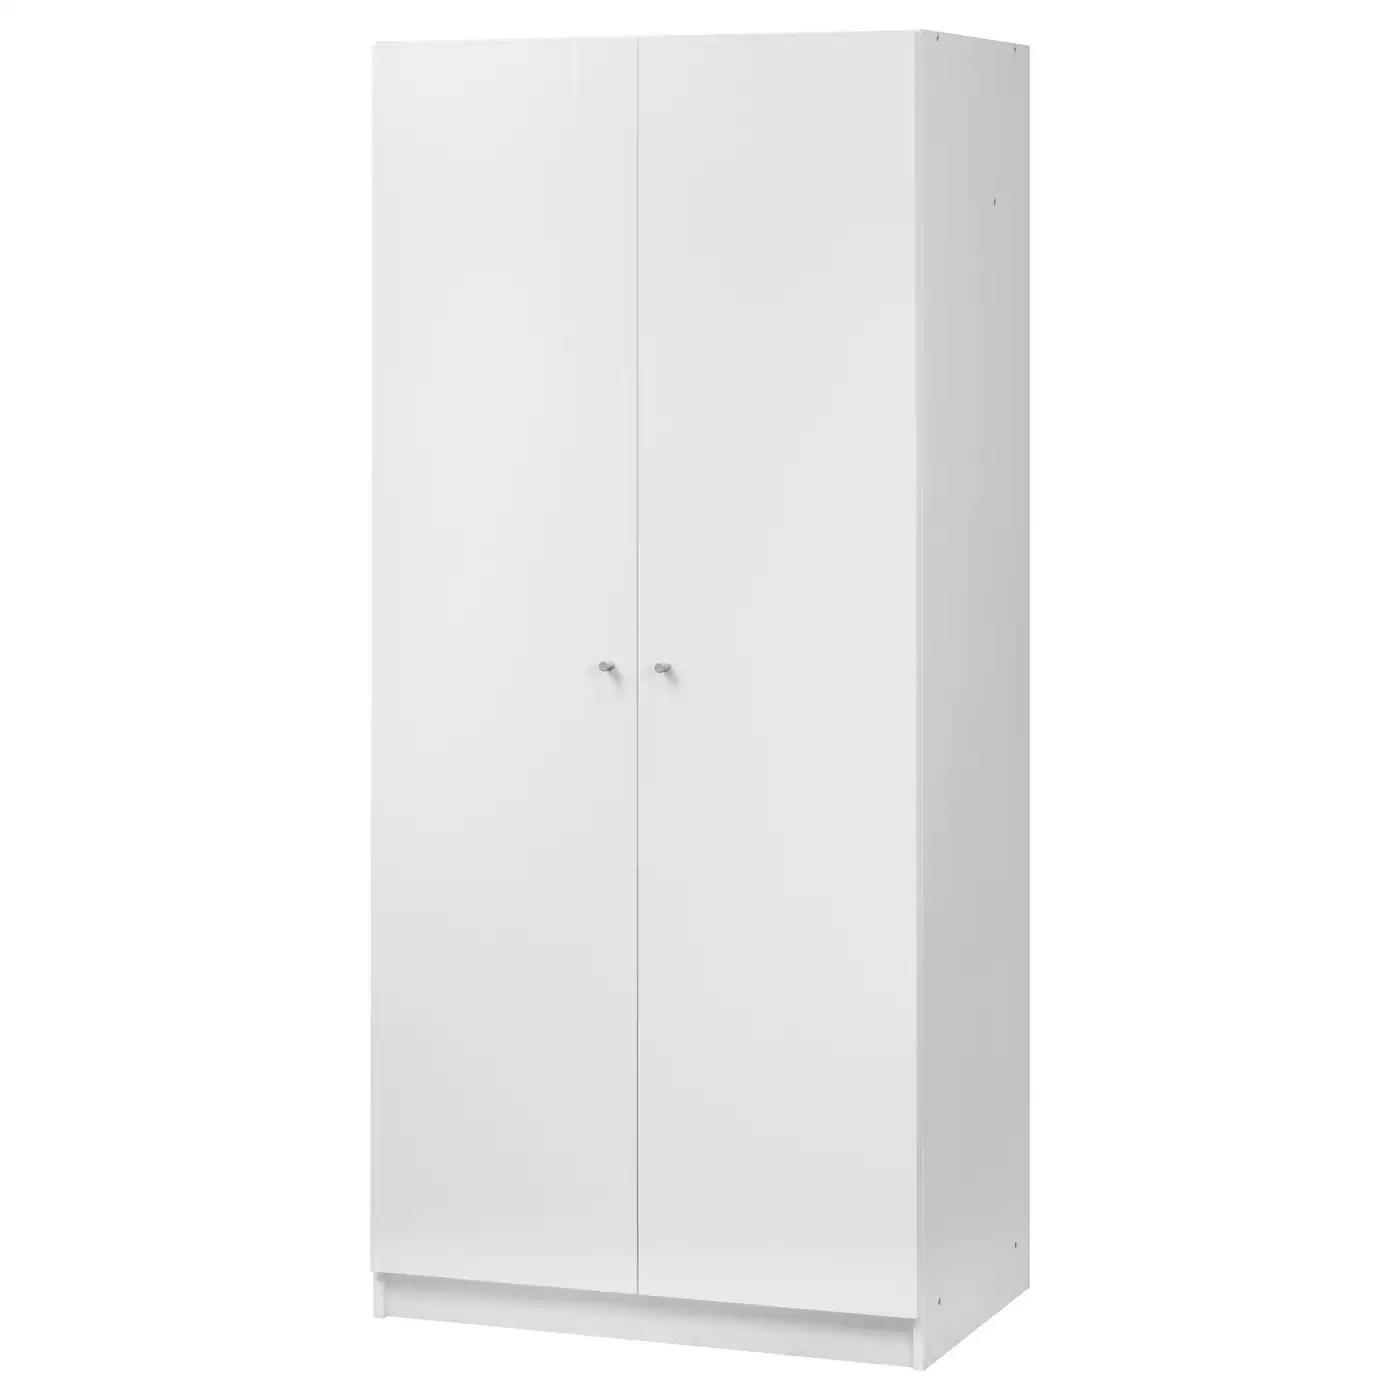 Ikea Schrank Cm Tief